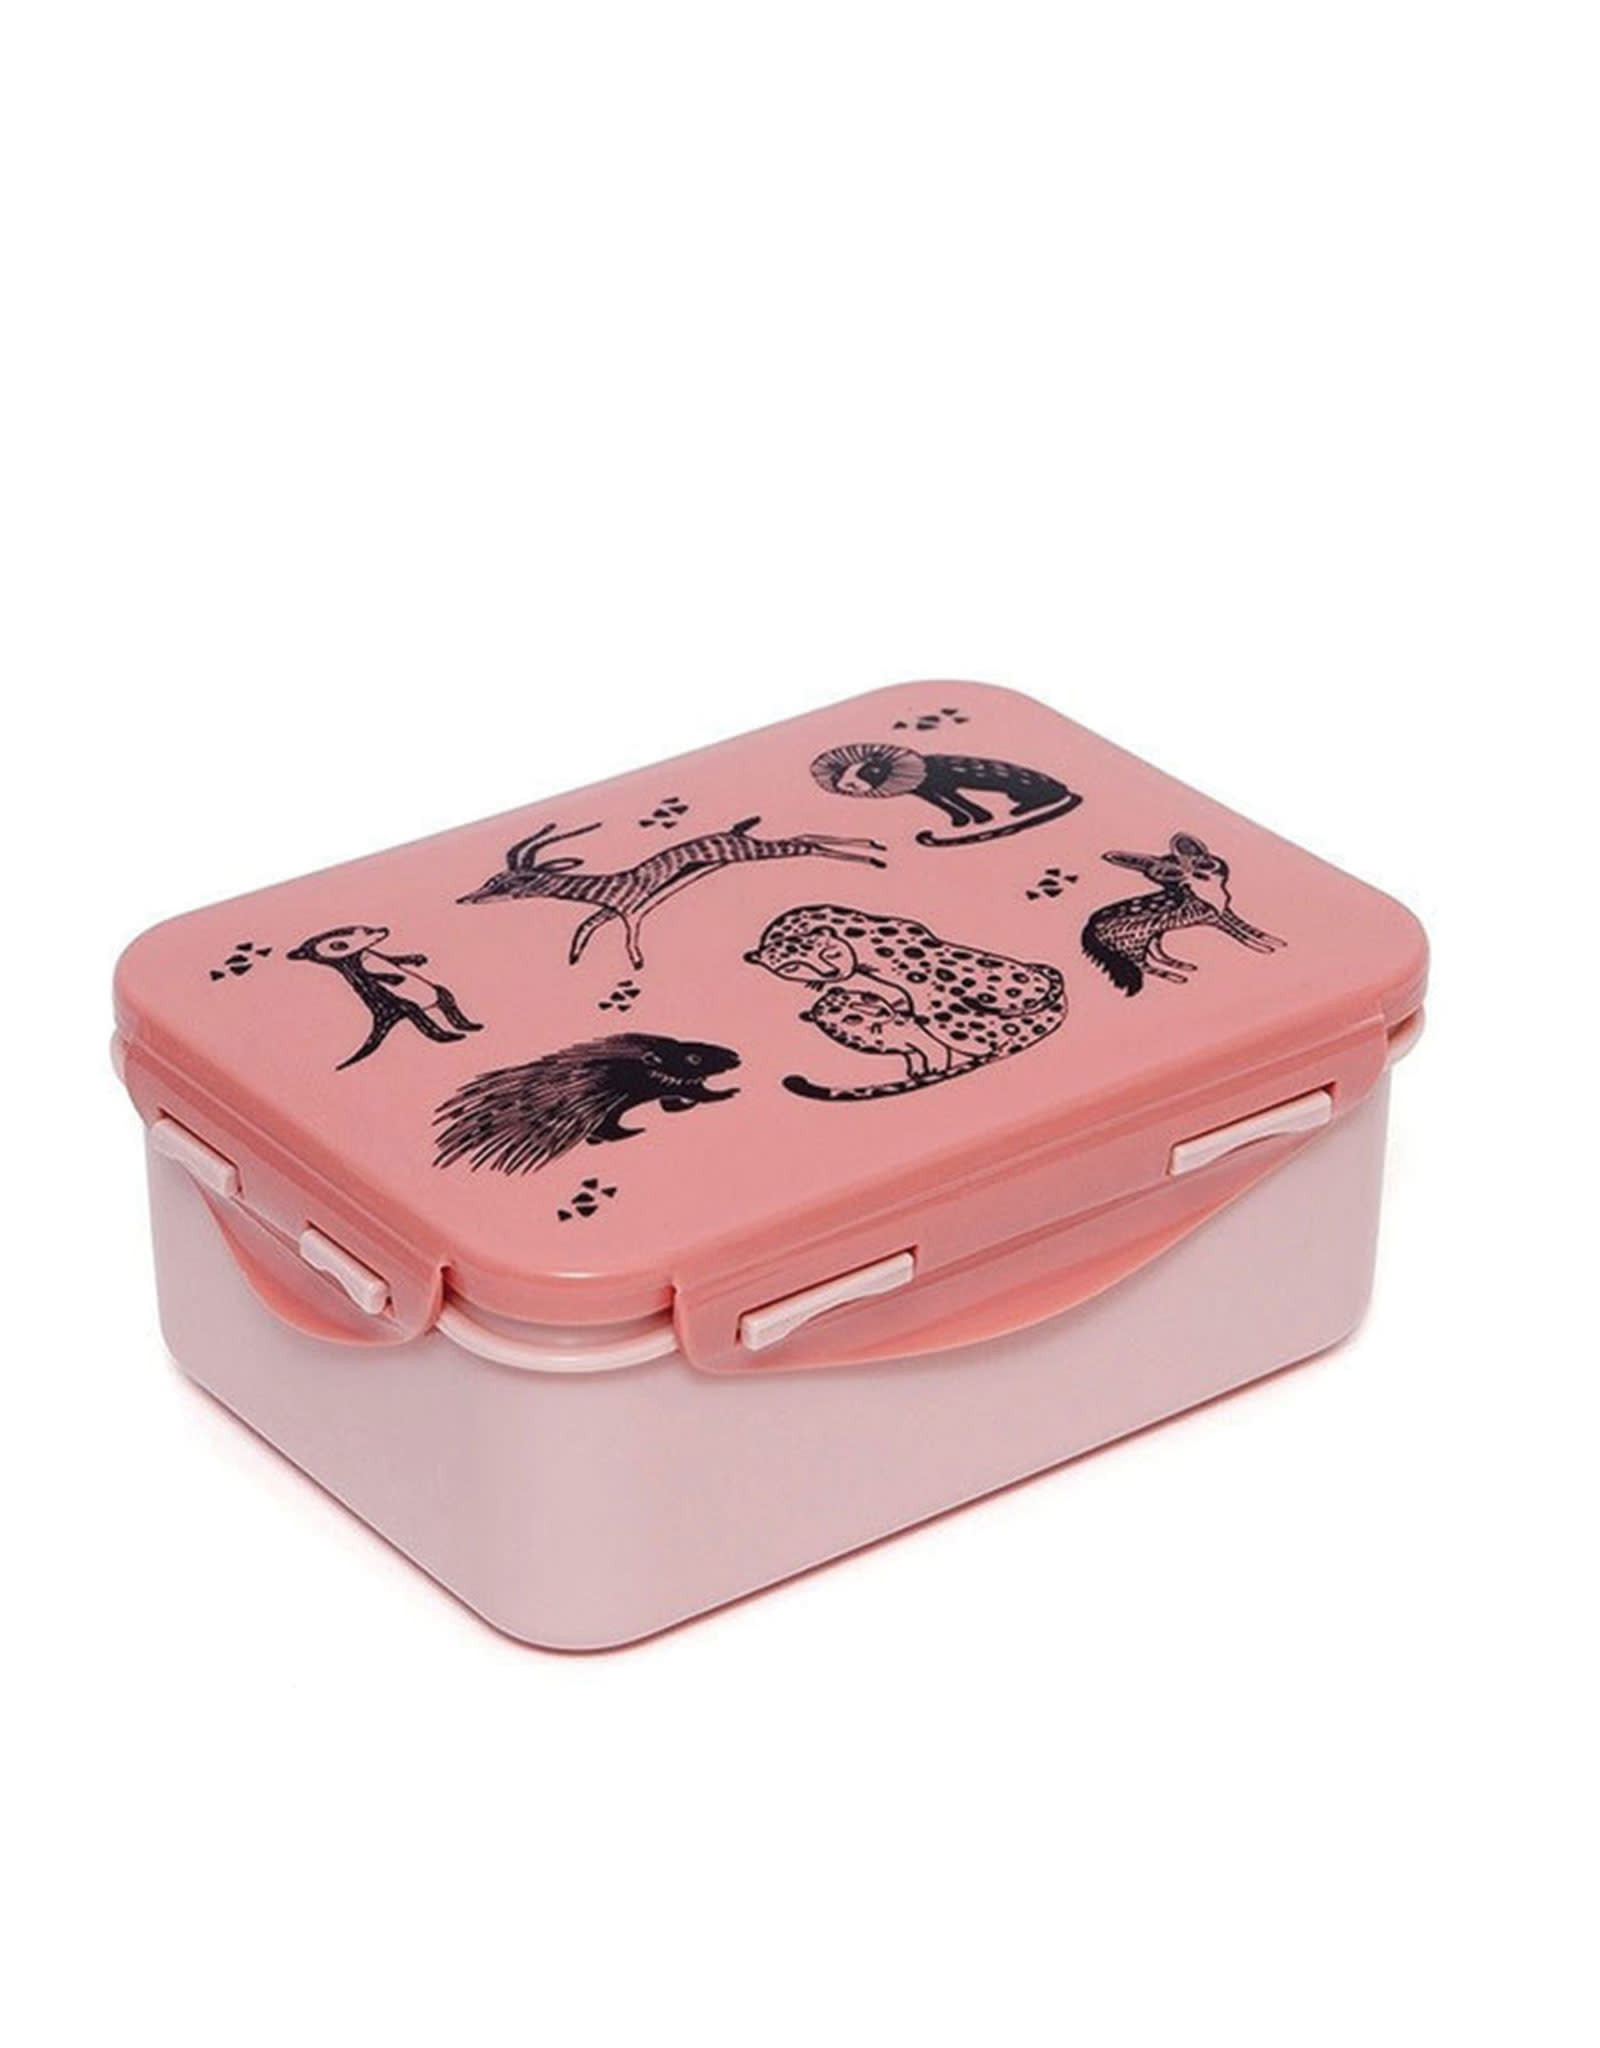 Petit Monkey Lunchbox - Black Animal Pink